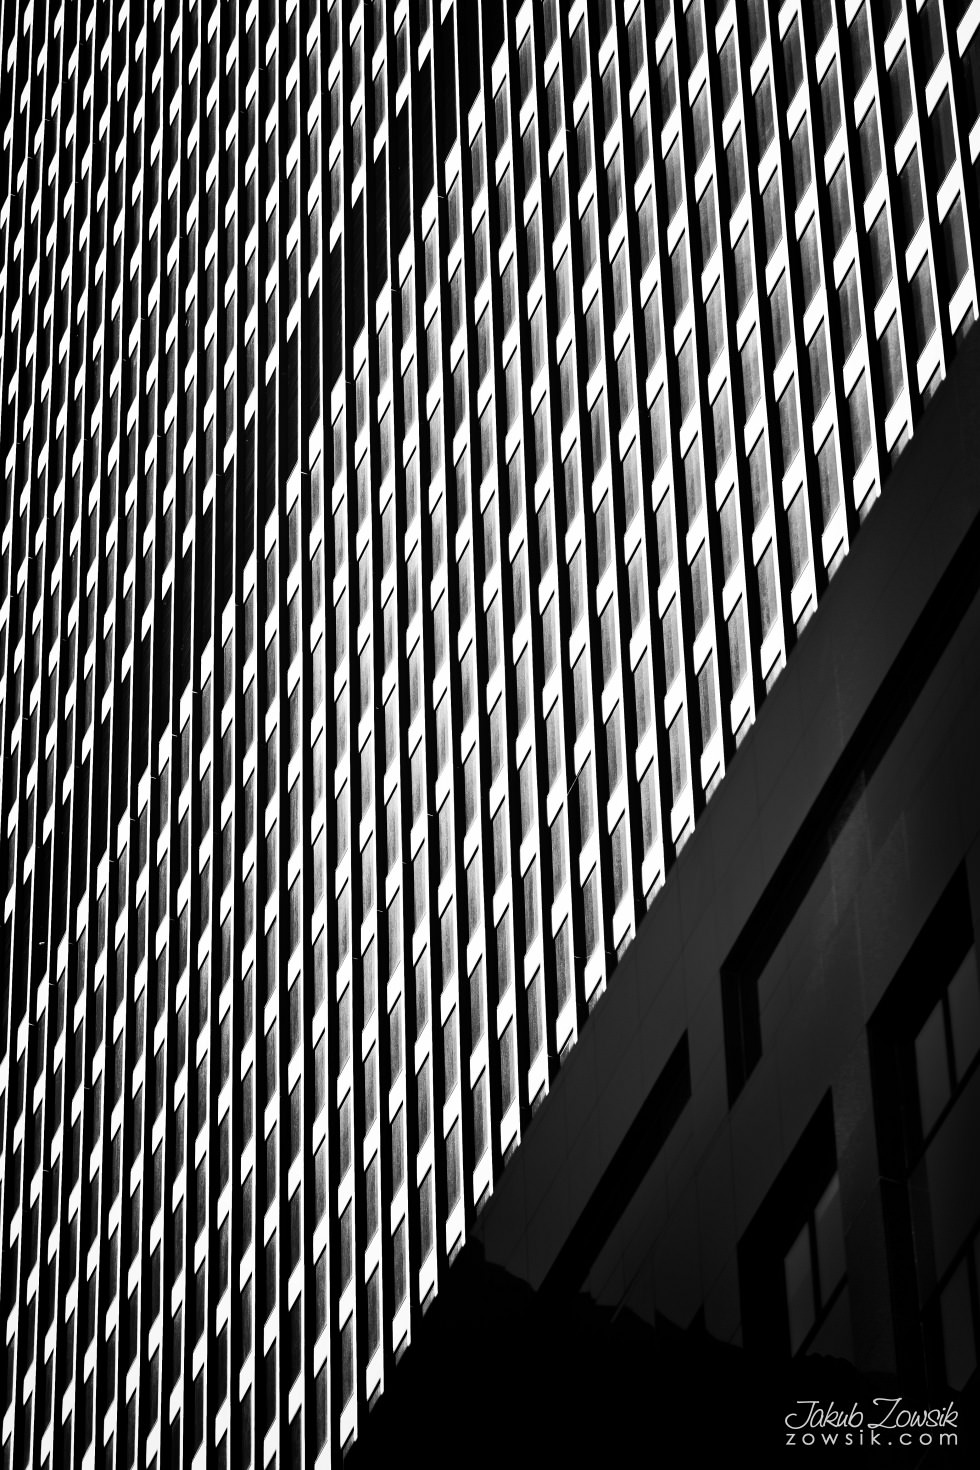 Toronto-picture-5dmk2-IMG_9826